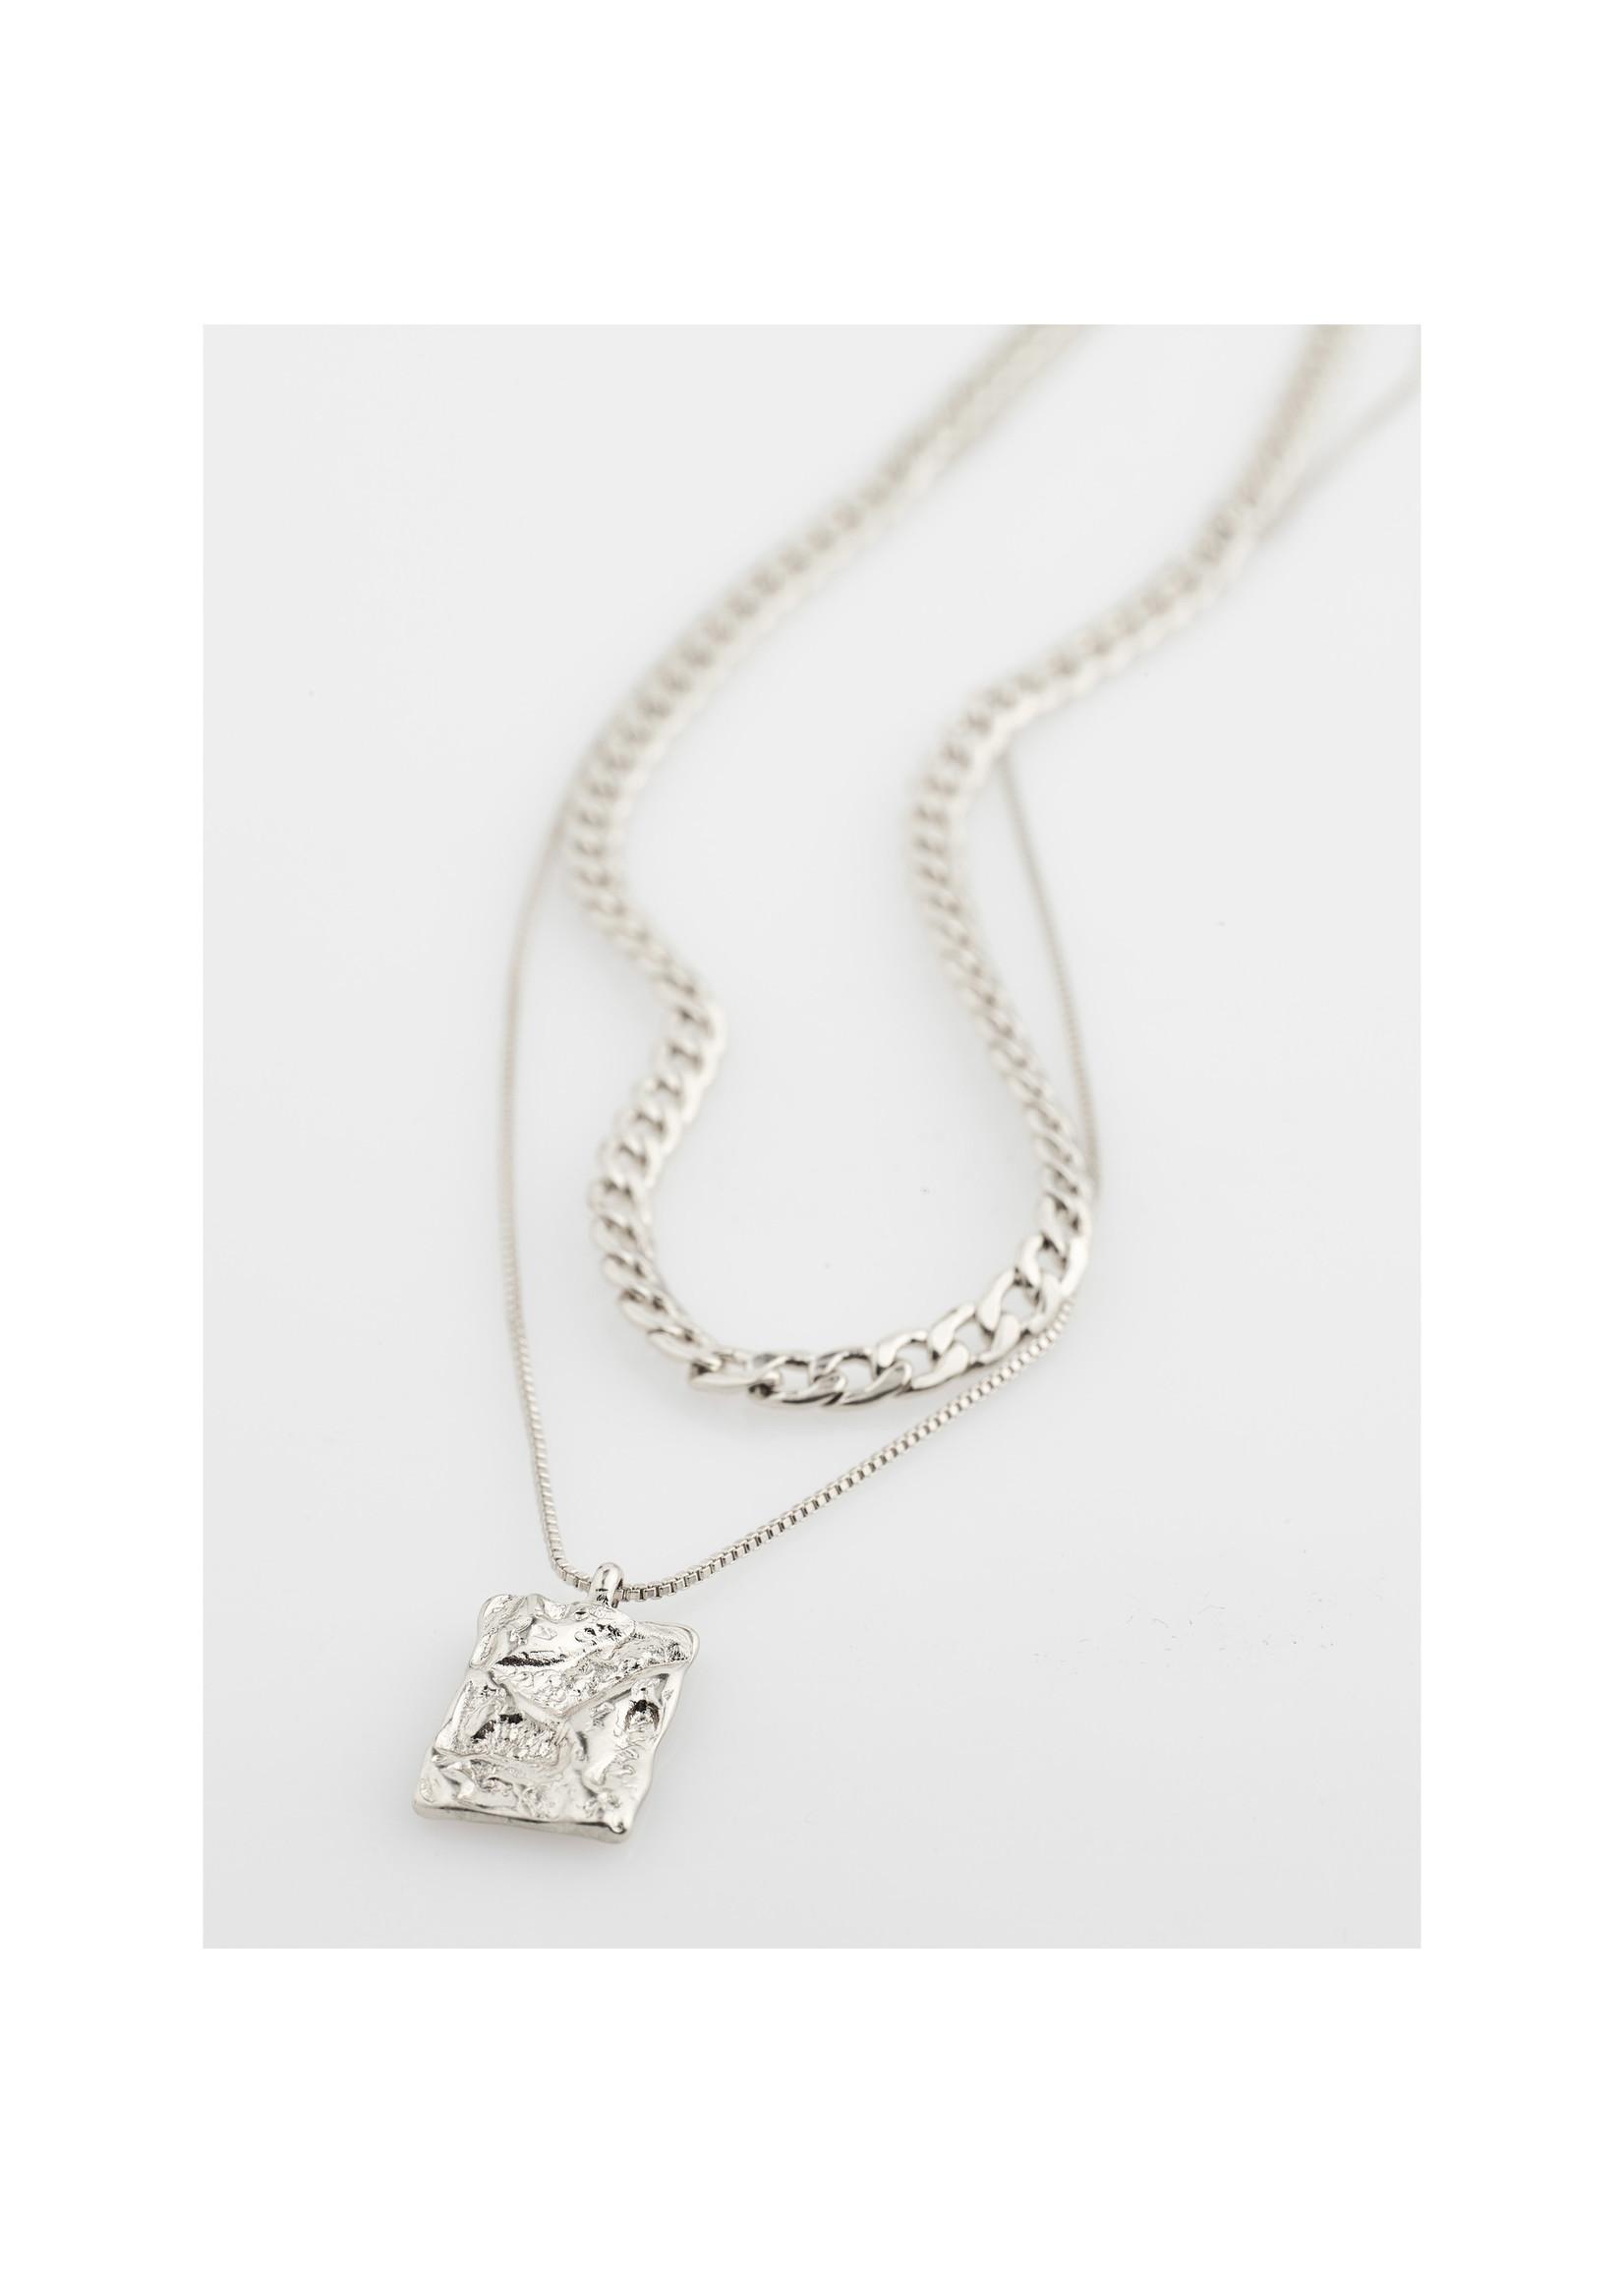 Pilgrim Jewellery Bathilda 2-in-1 Necklace - Silver